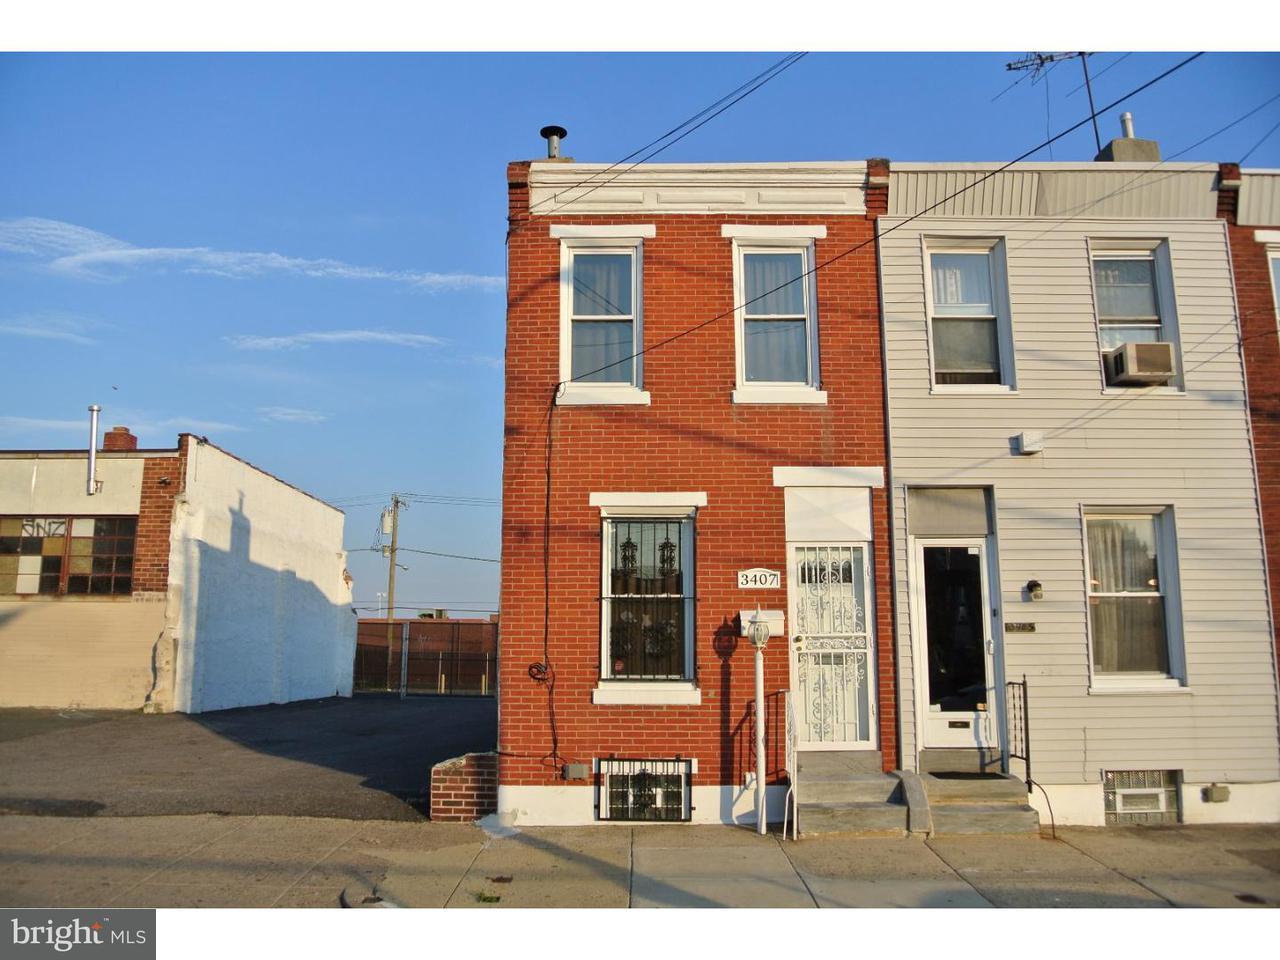 3407  Weikel Philadelphia, PA 19134